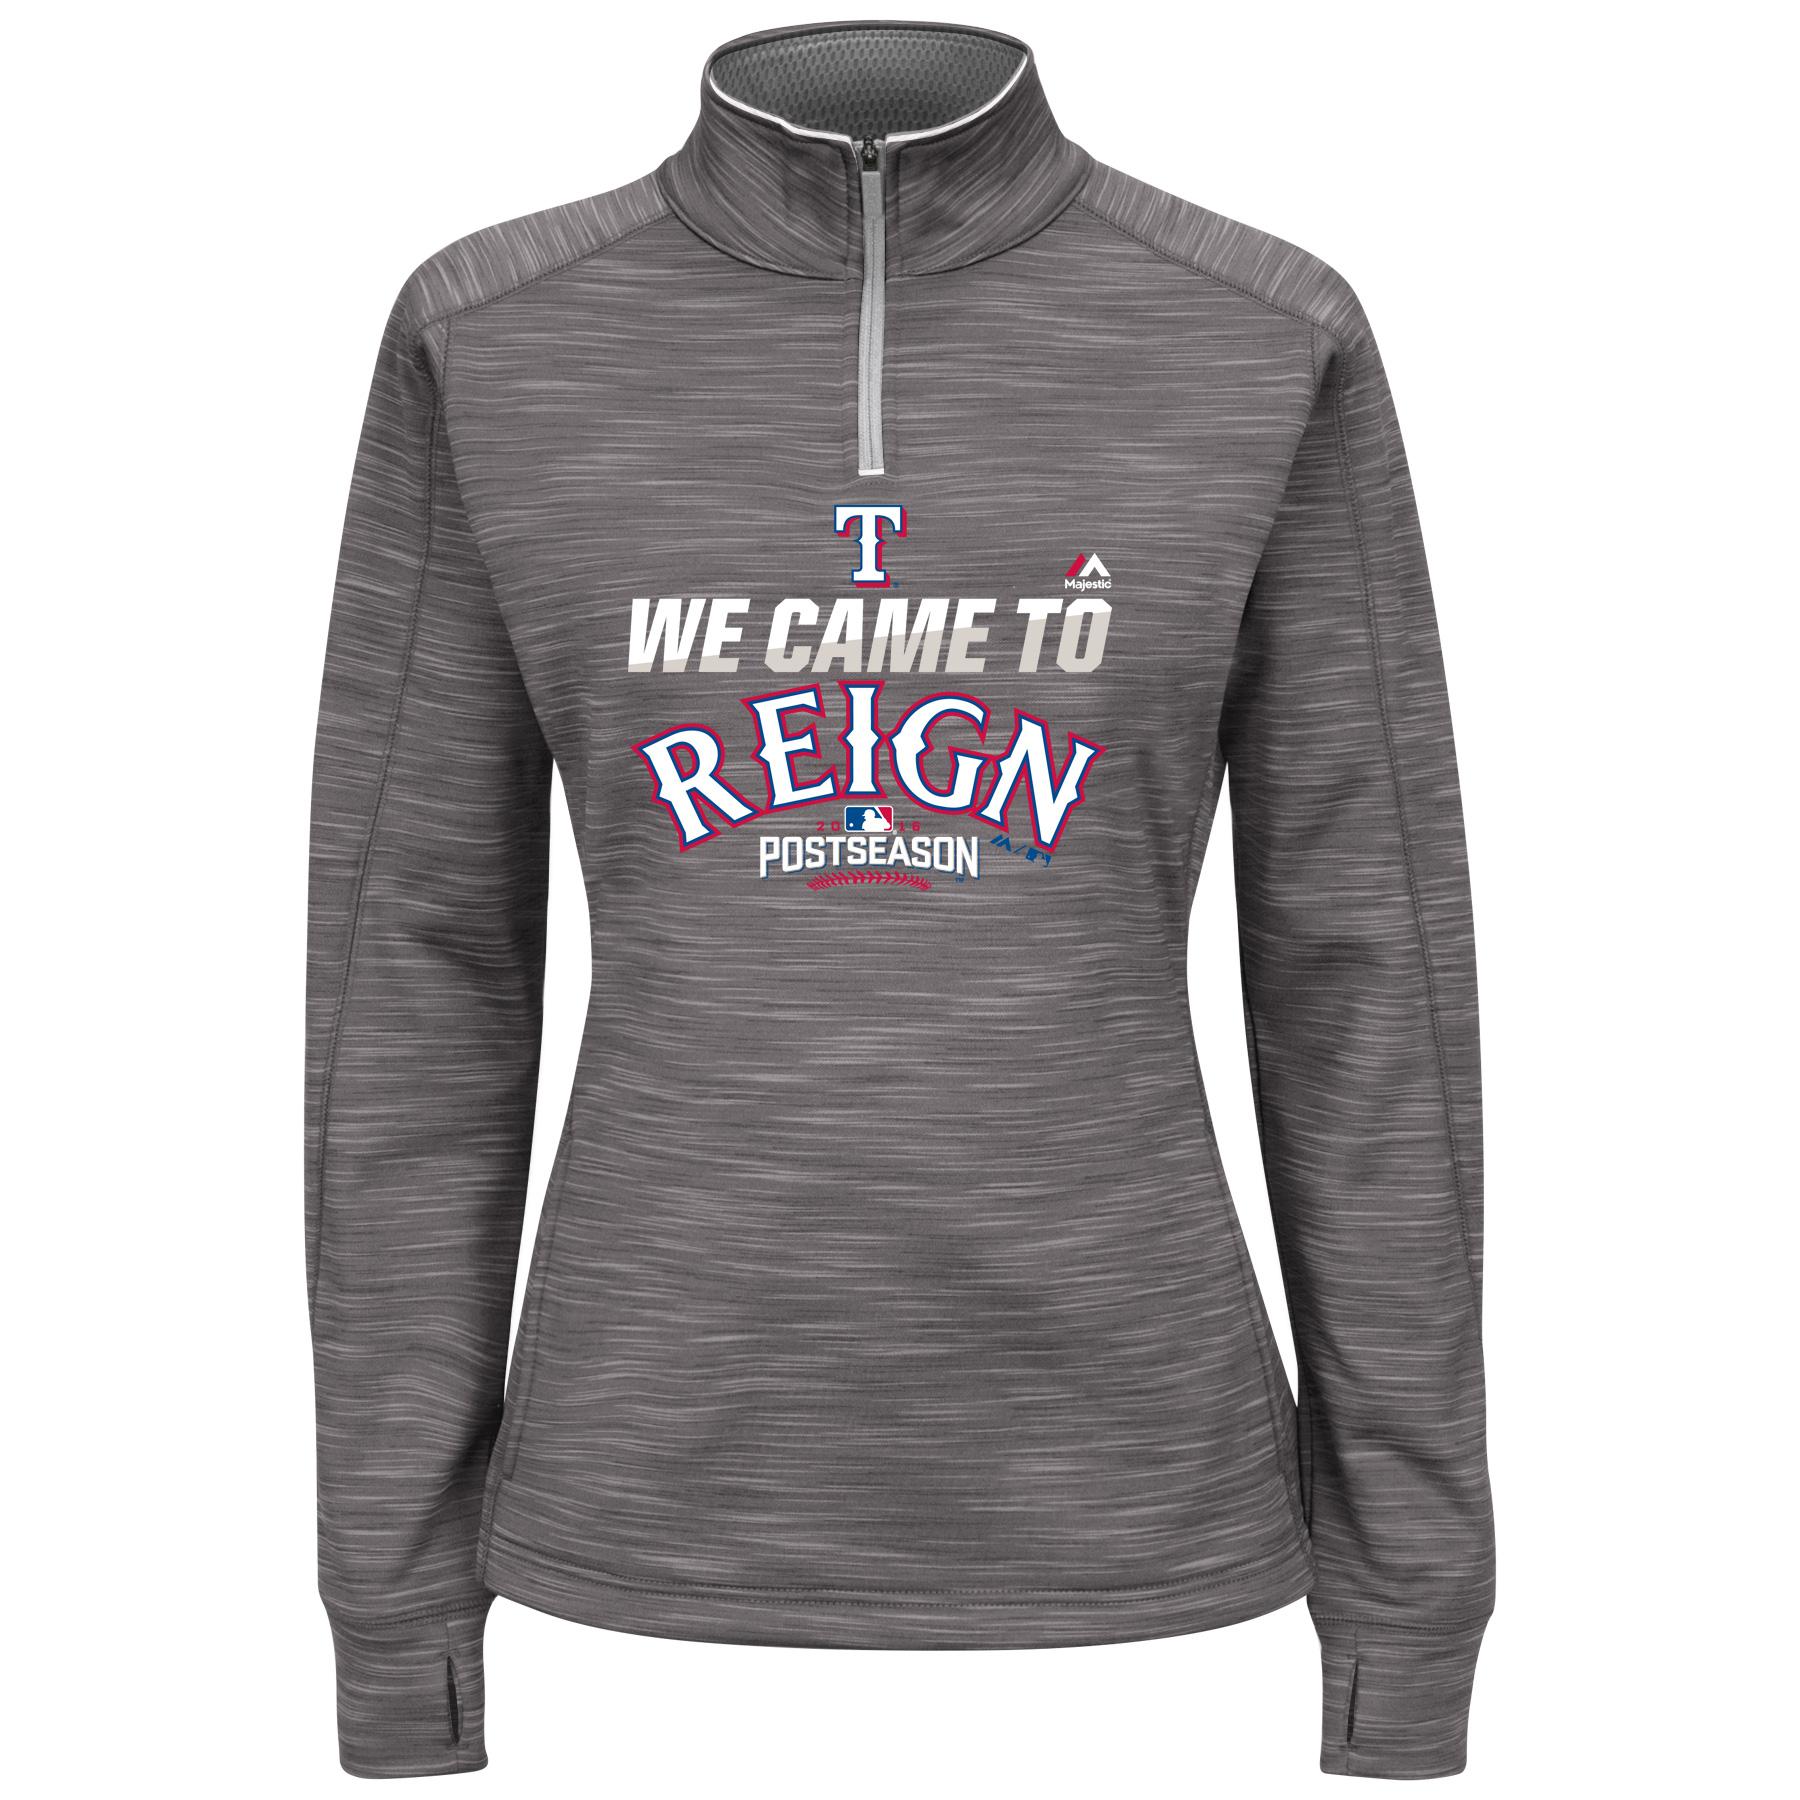 Texas Rangers Women's 2016 Postseason Participant We Came to Reign 1/4-Zip Streak Fleece - Graphite